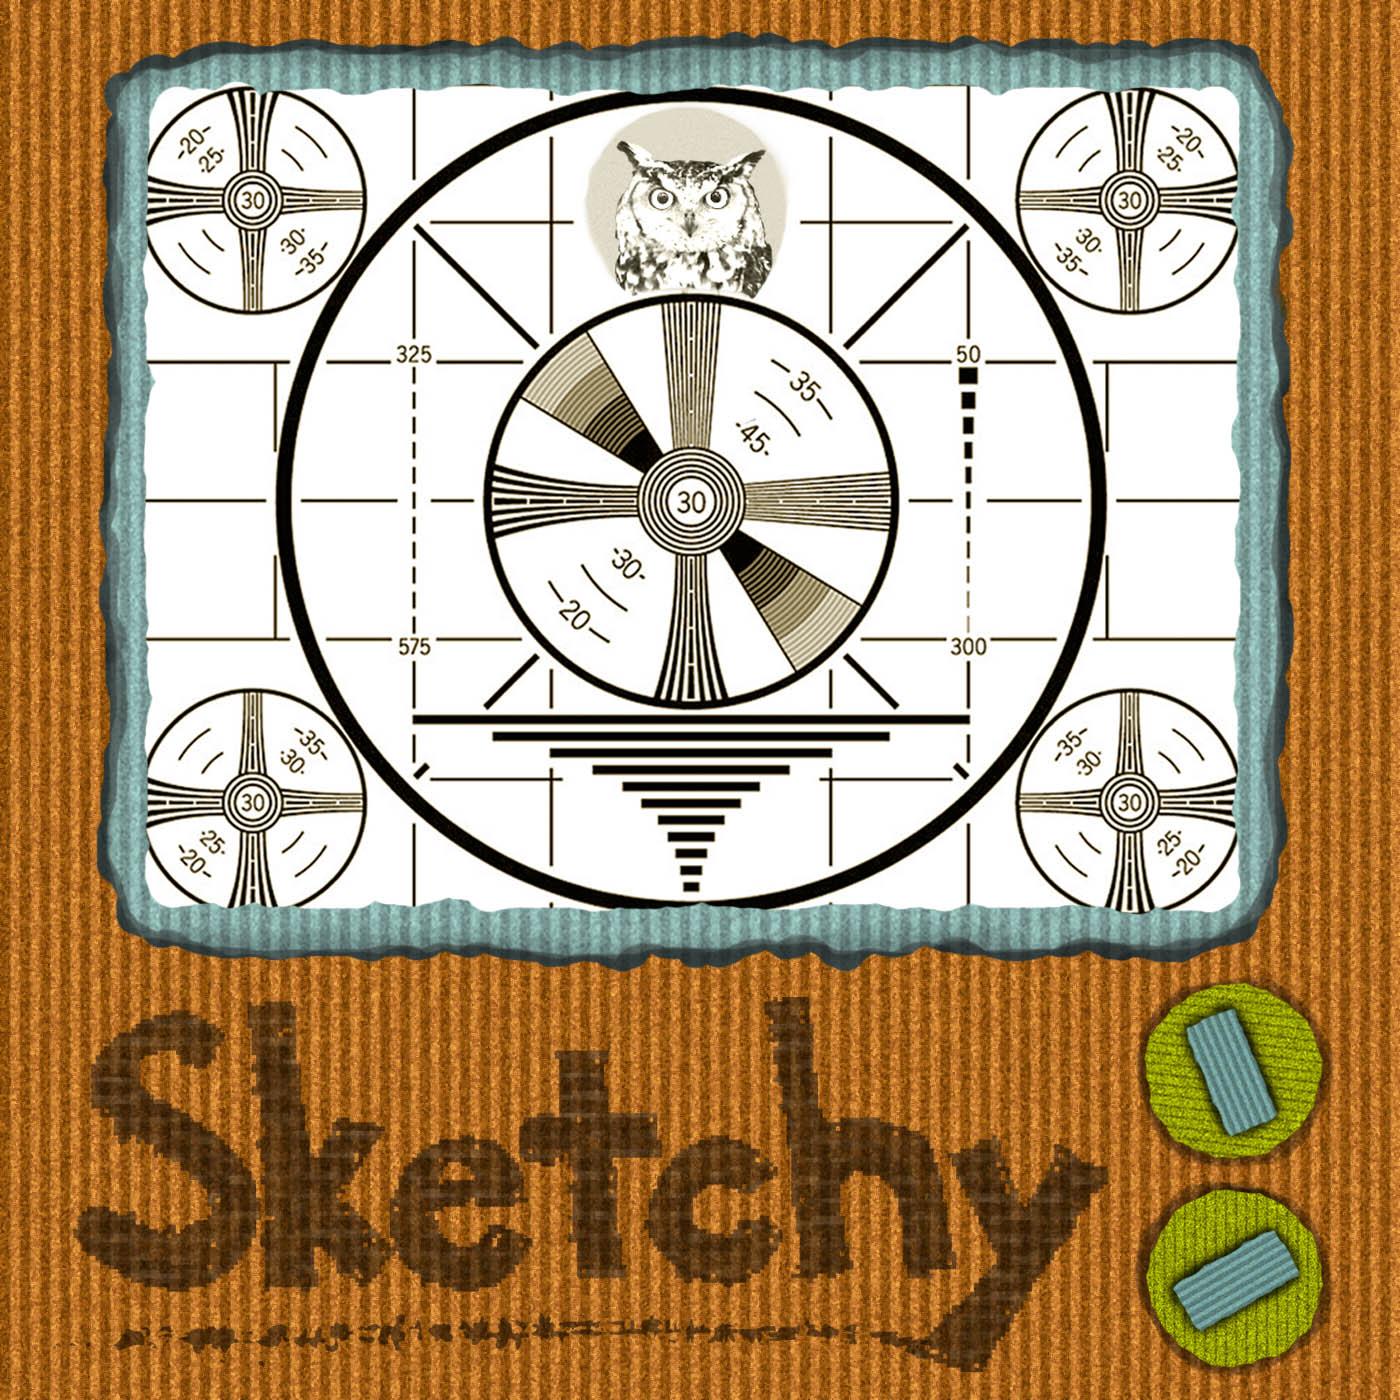 Episode 182 - Sketchy Best Of Vol. 1